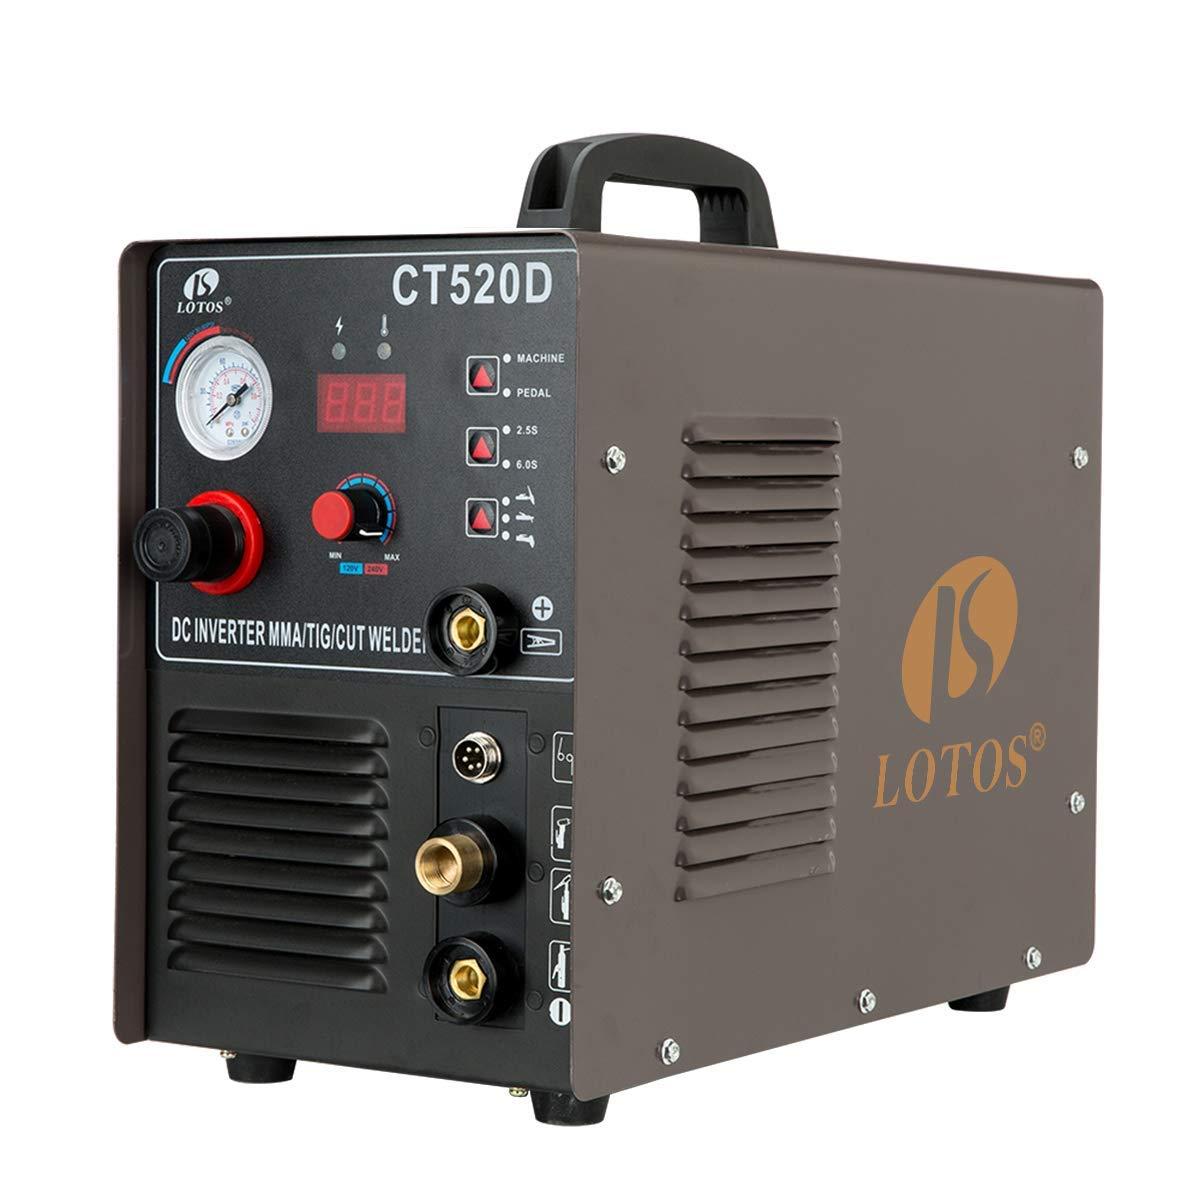 LOTOS CT520D Plasma Cutter – Best Three-in-One Combon